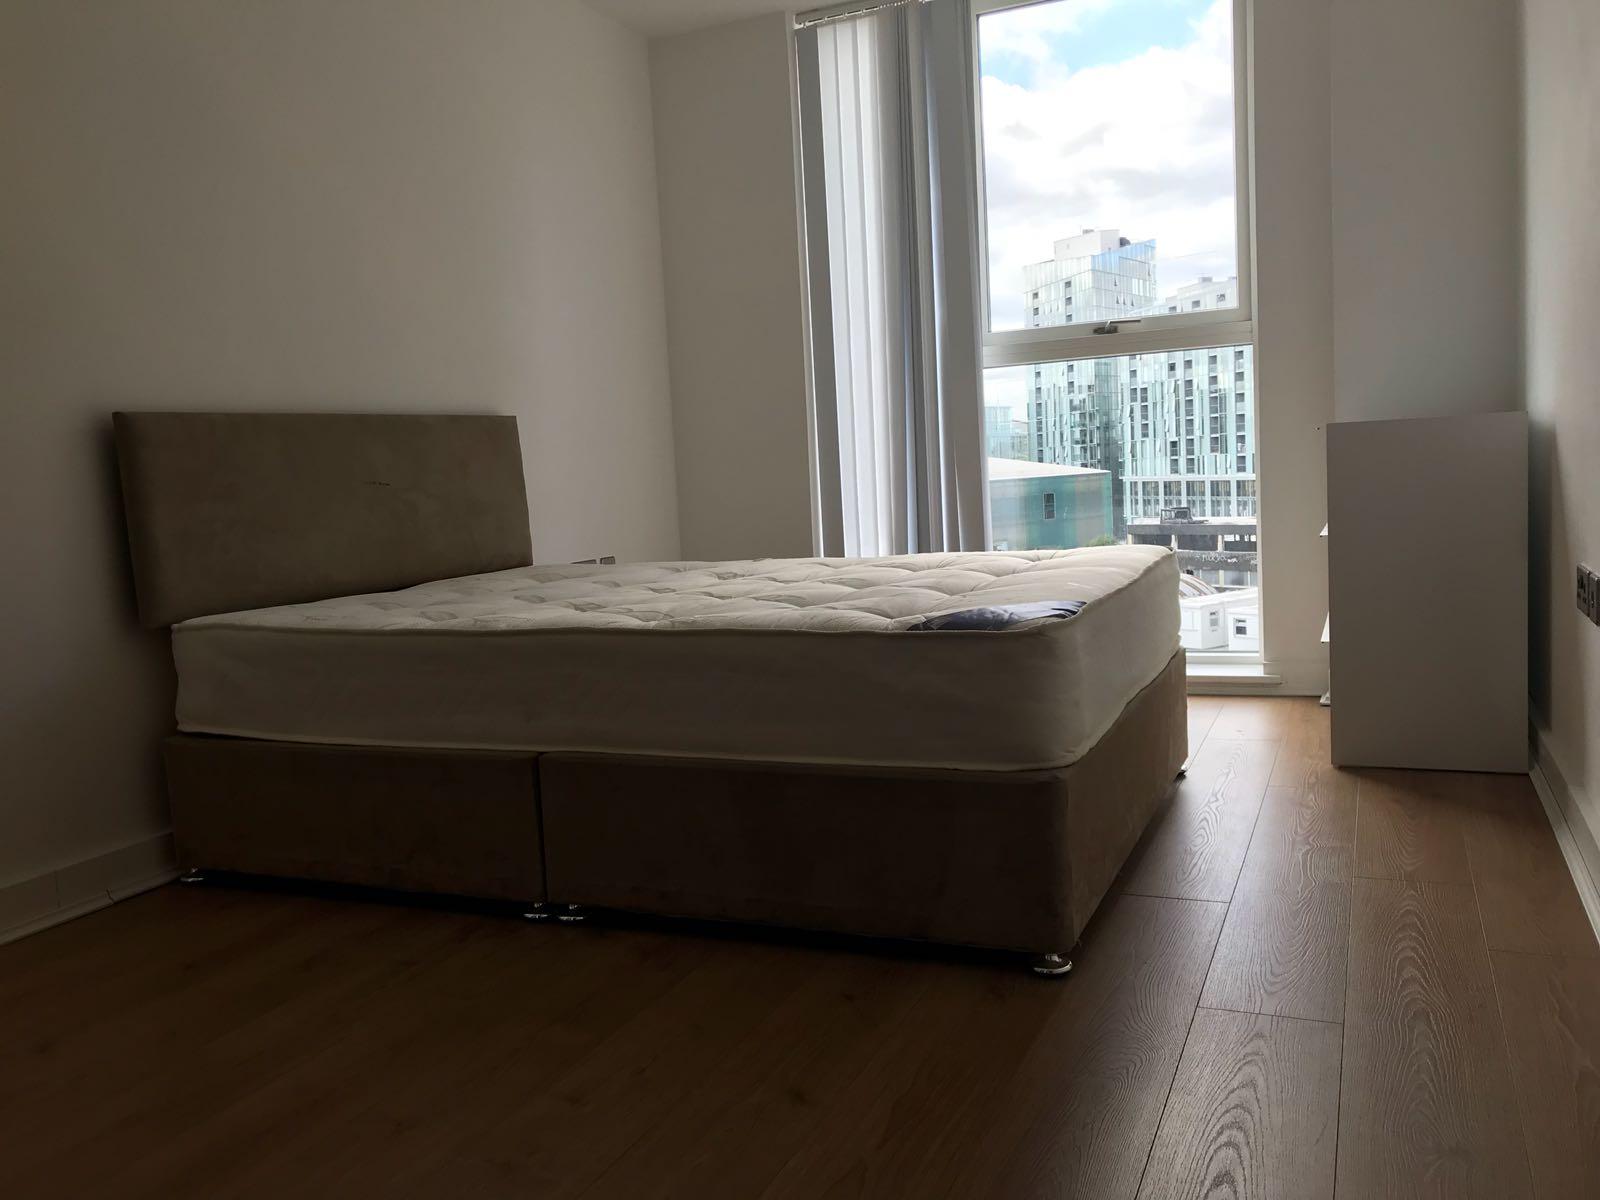 1 room in Greenwich, London, SE10 9FA RoomsLocal image